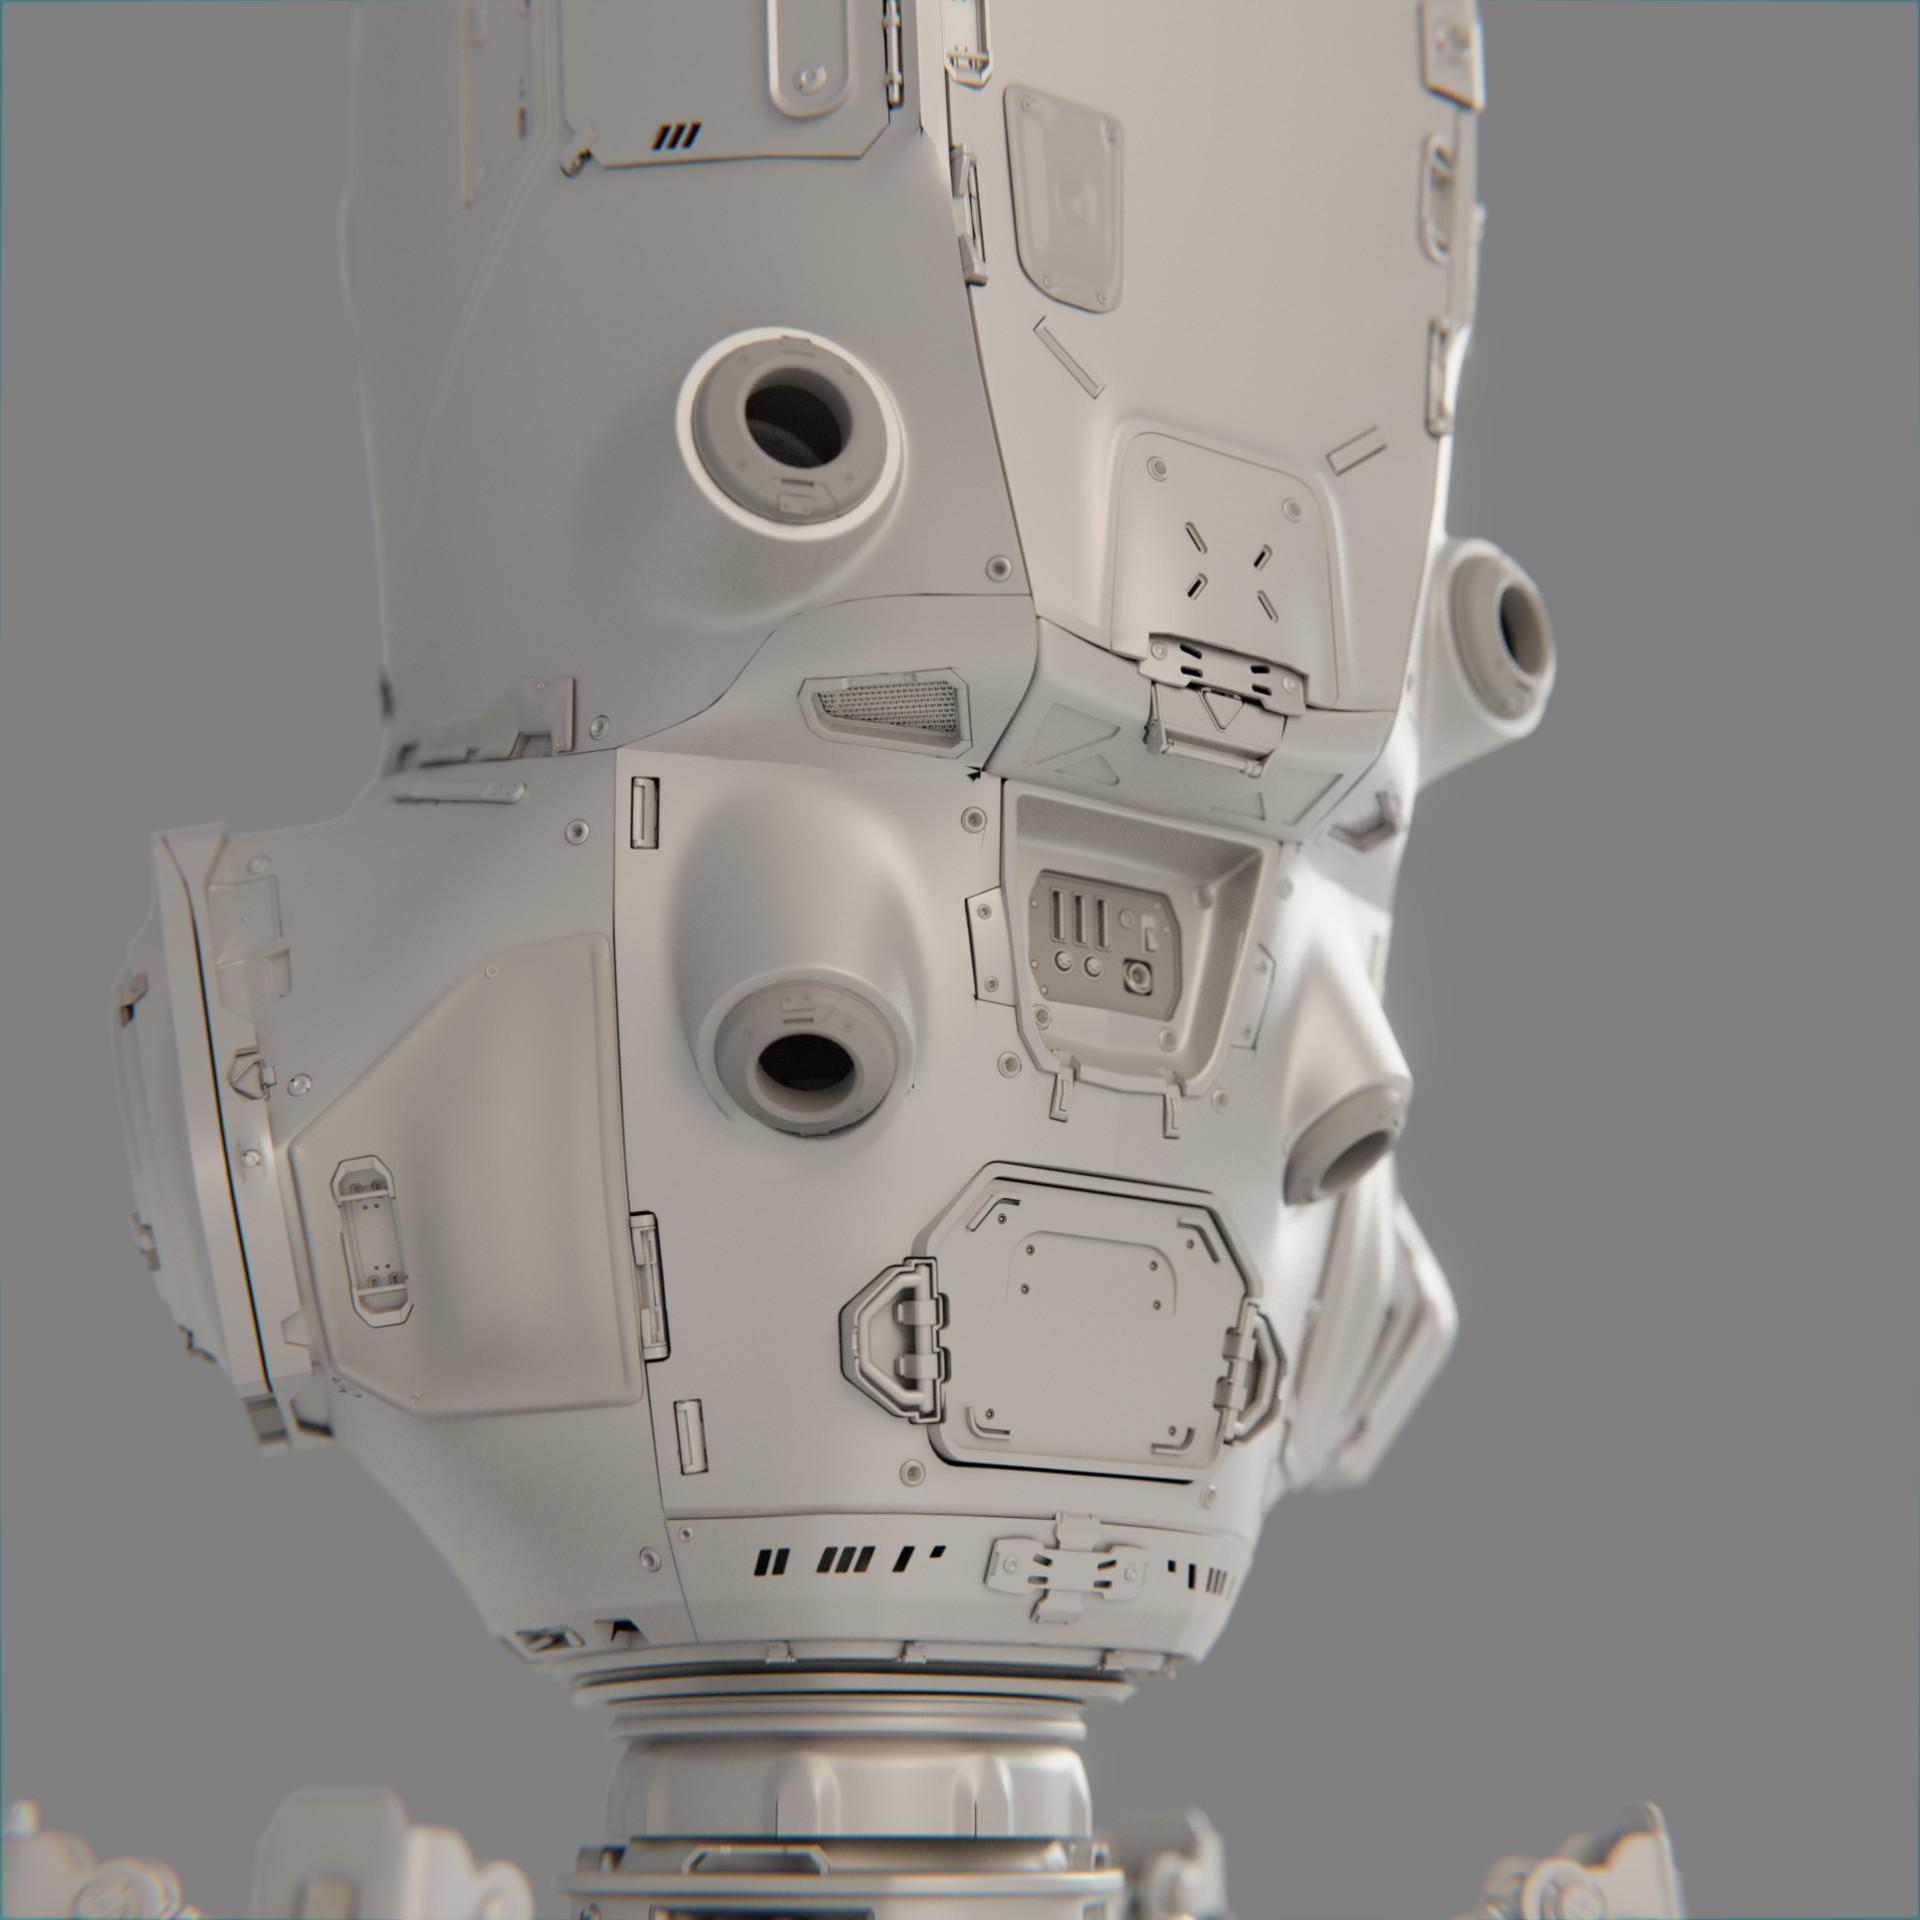 Victor duarte camera 006